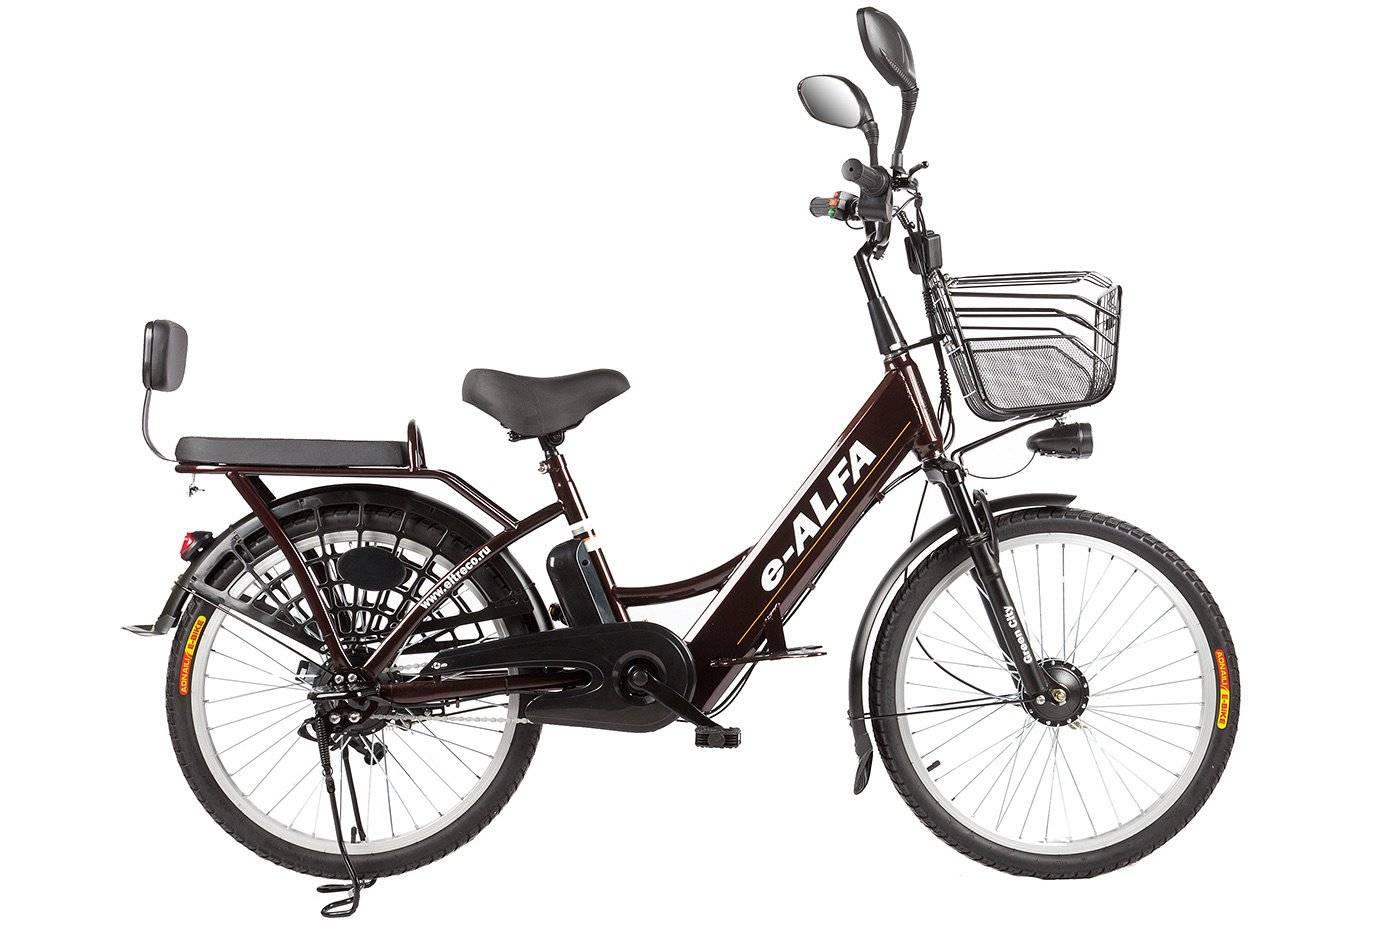 Велогибрид Eltreco e-ALFA 350W, 010822-0082, фото 5